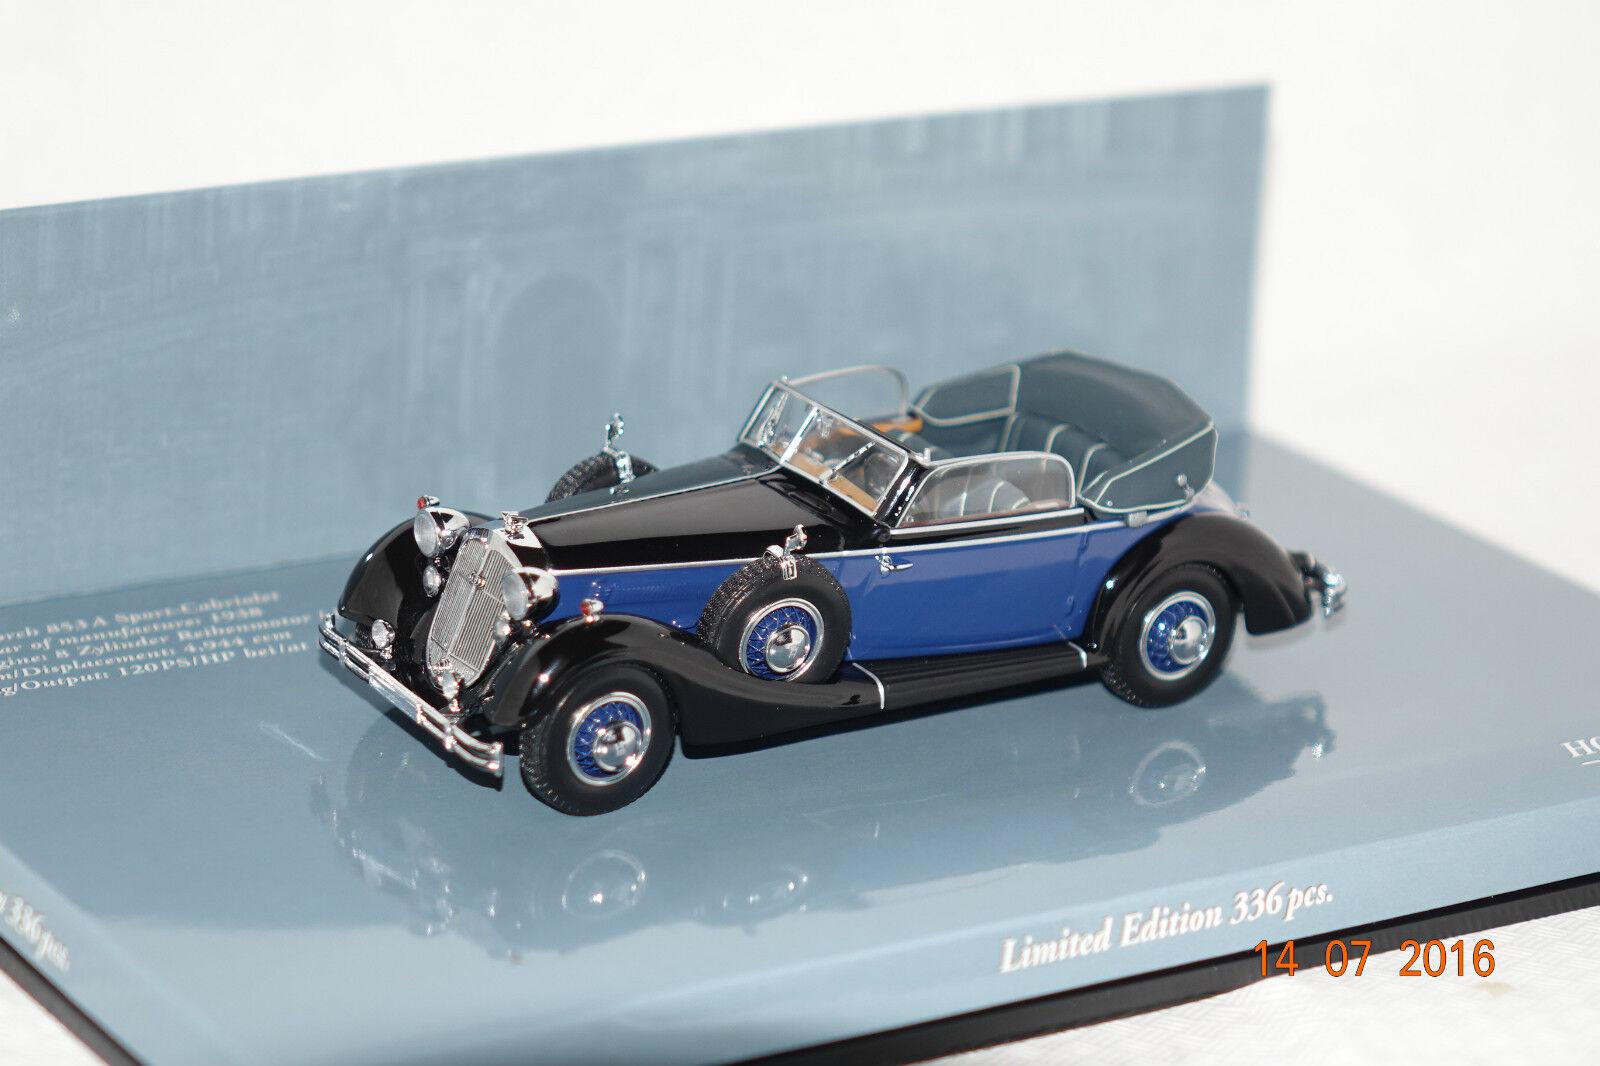 Autresdomaines 853 a sport cabriolet 1938 Noir-Bleu 1 43 MINICHAMPS NEUF & OVP 436012036